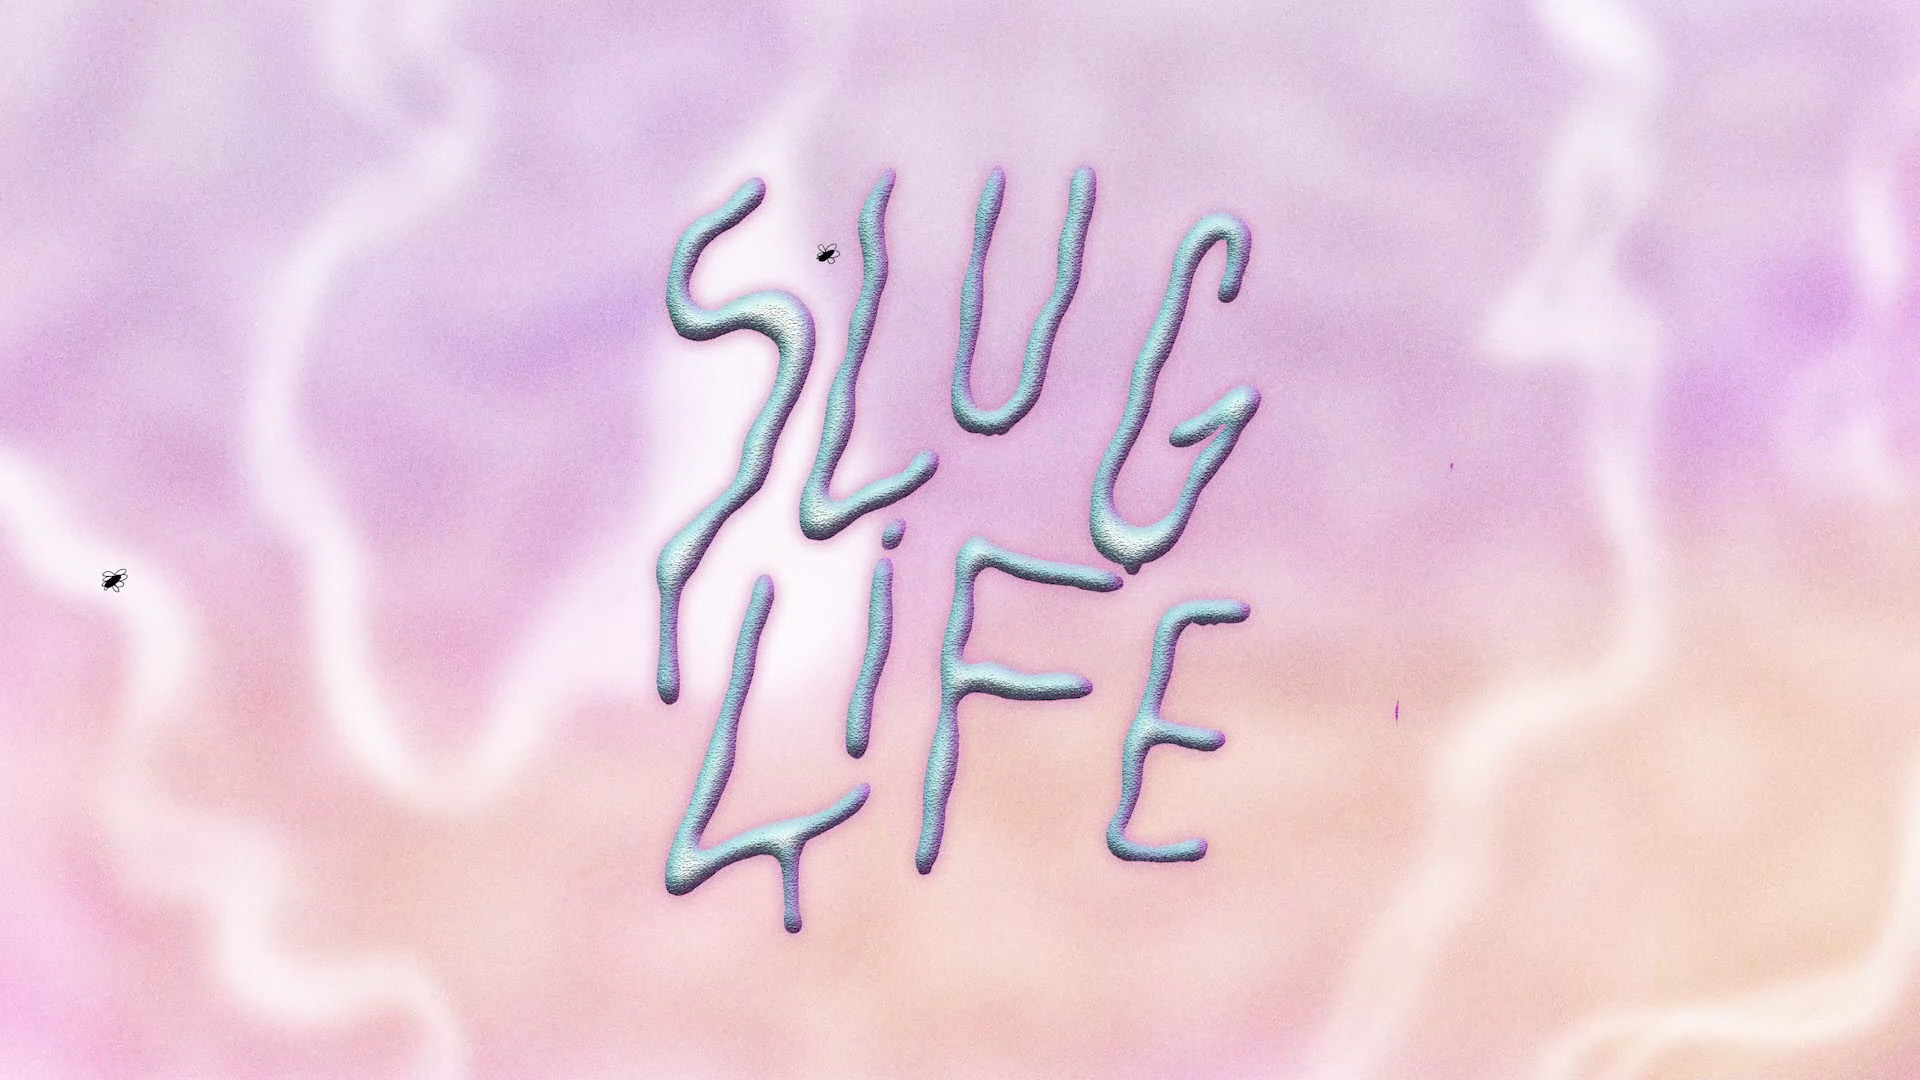 roofstudio_slug-life_styleframe-10